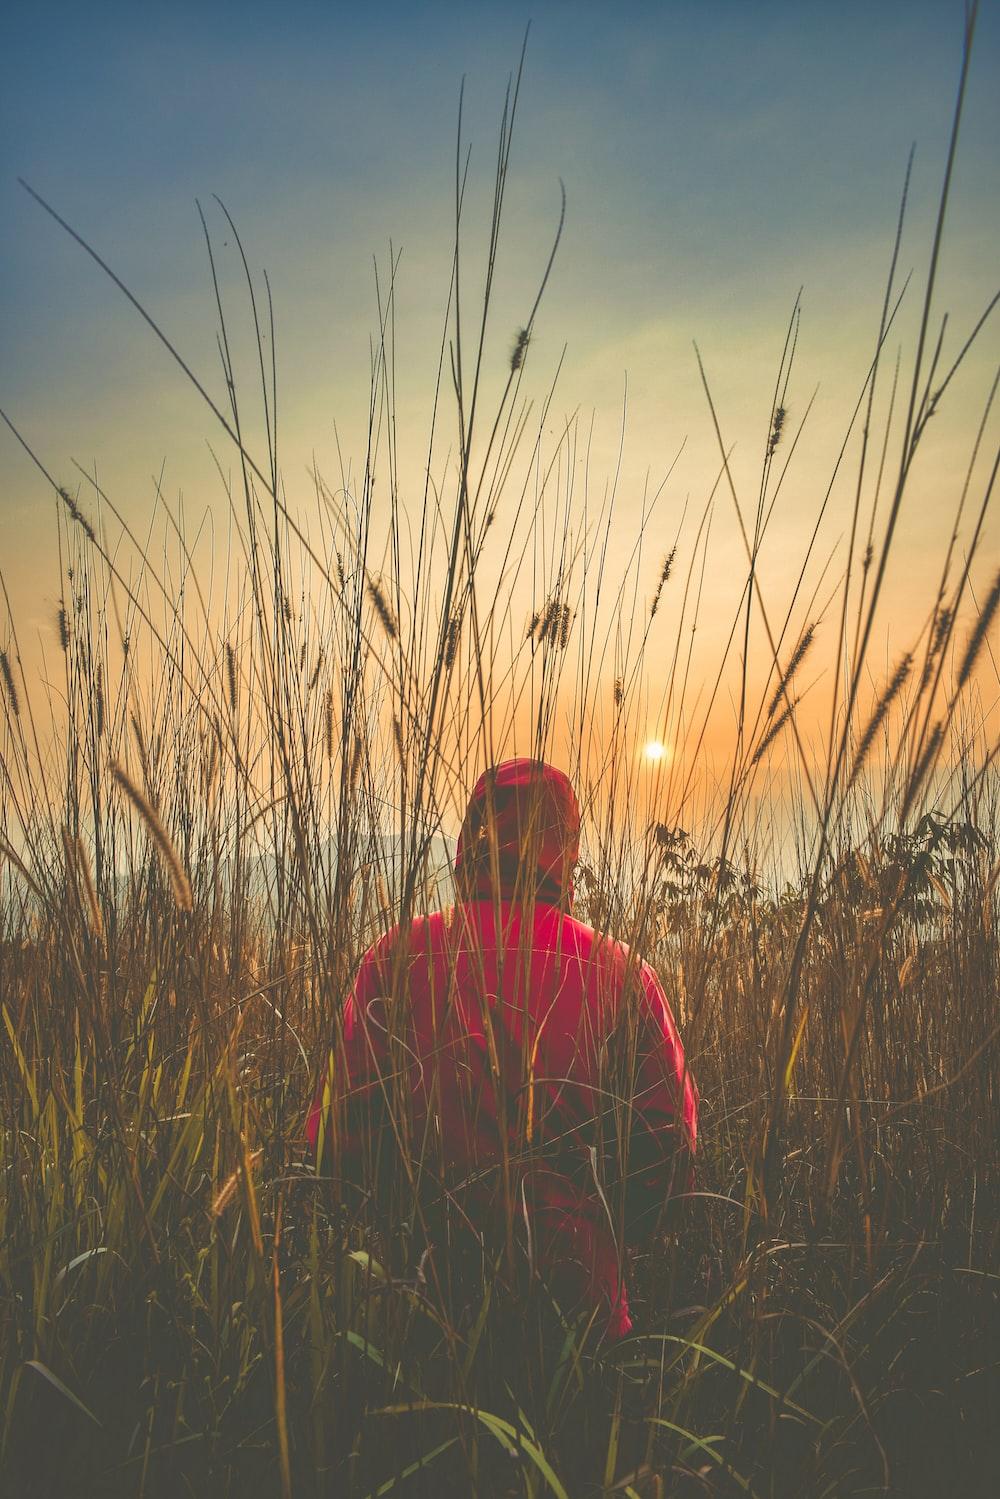 person in red hoodie walking in grass field